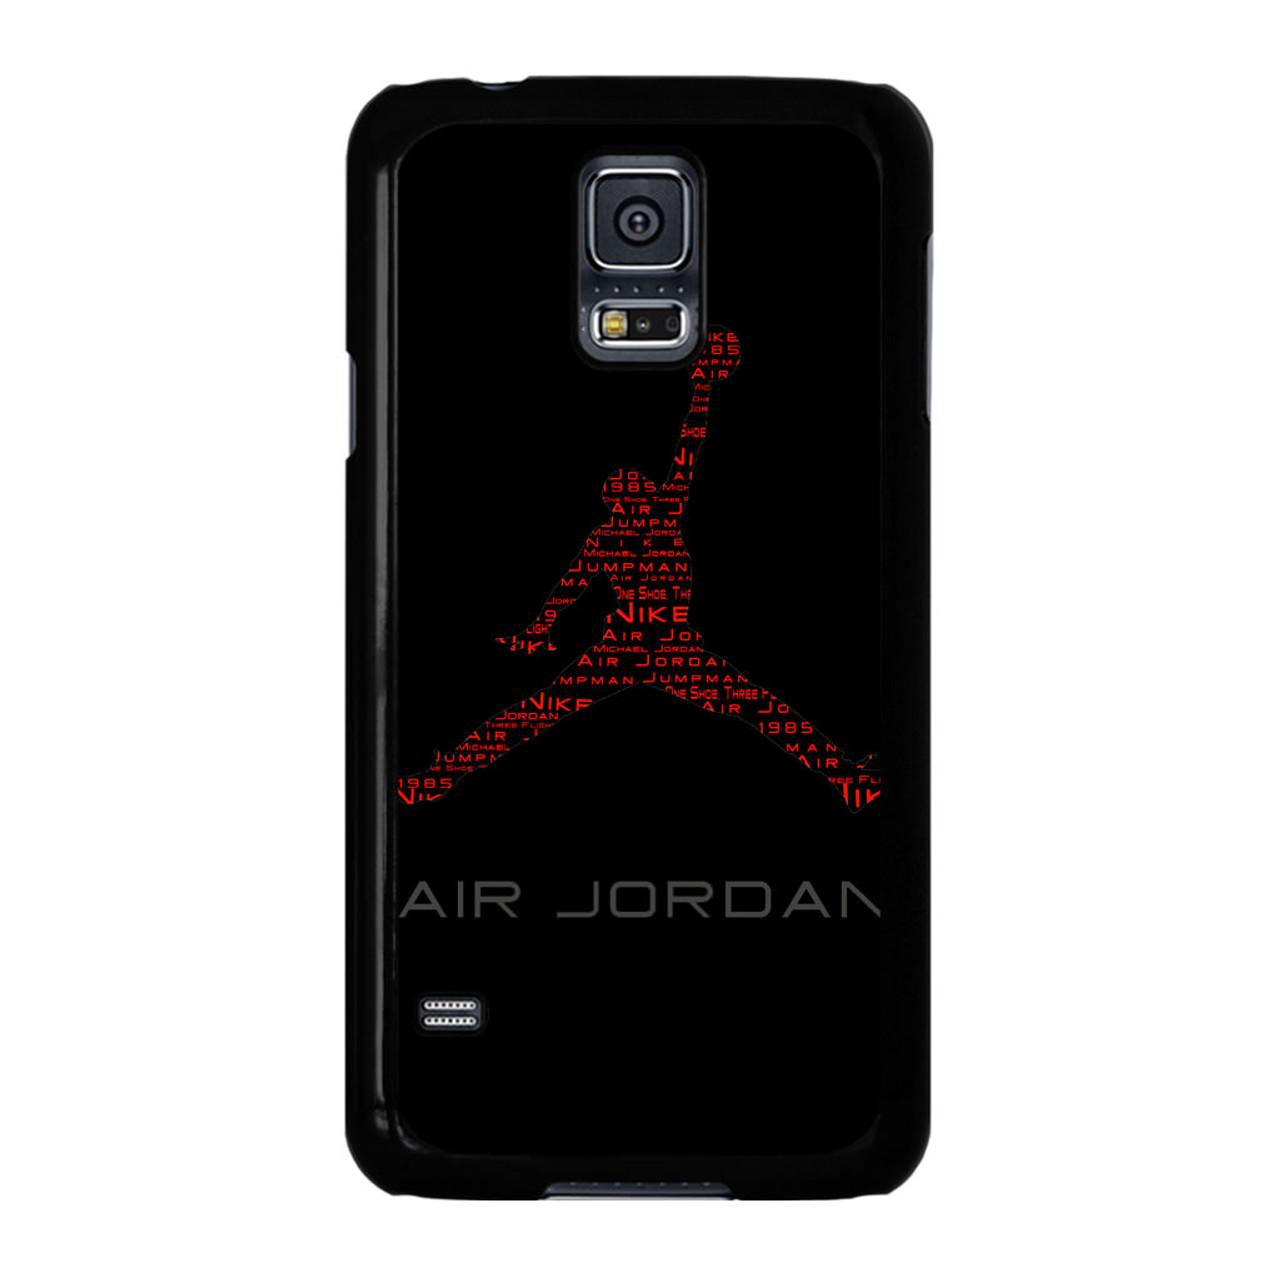 new concept 3eb35 d5b68 Sports Air Jordan Samsung Galaxy S5 Case - CASESHUNTER